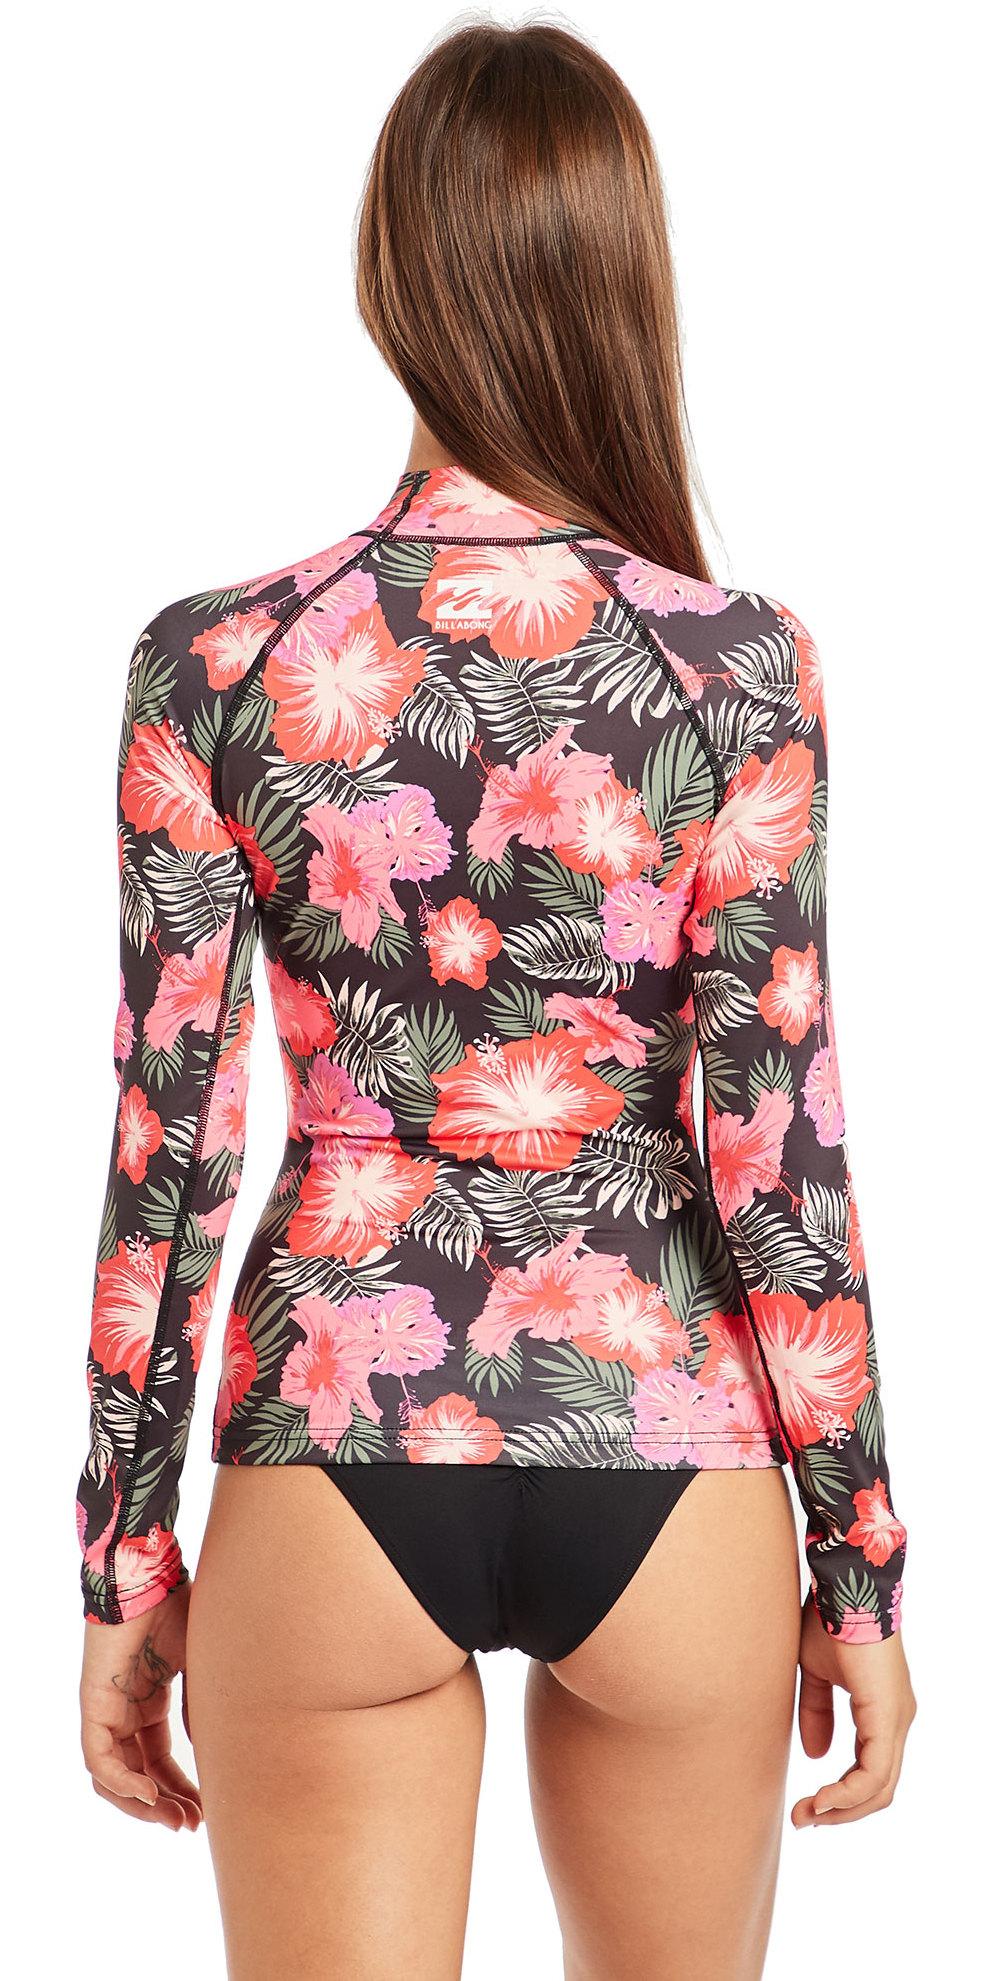 f1ef9840530 2019 Billabong Womens Flower Long Sleeve Rash Vest Hawaii N4GY04 ...